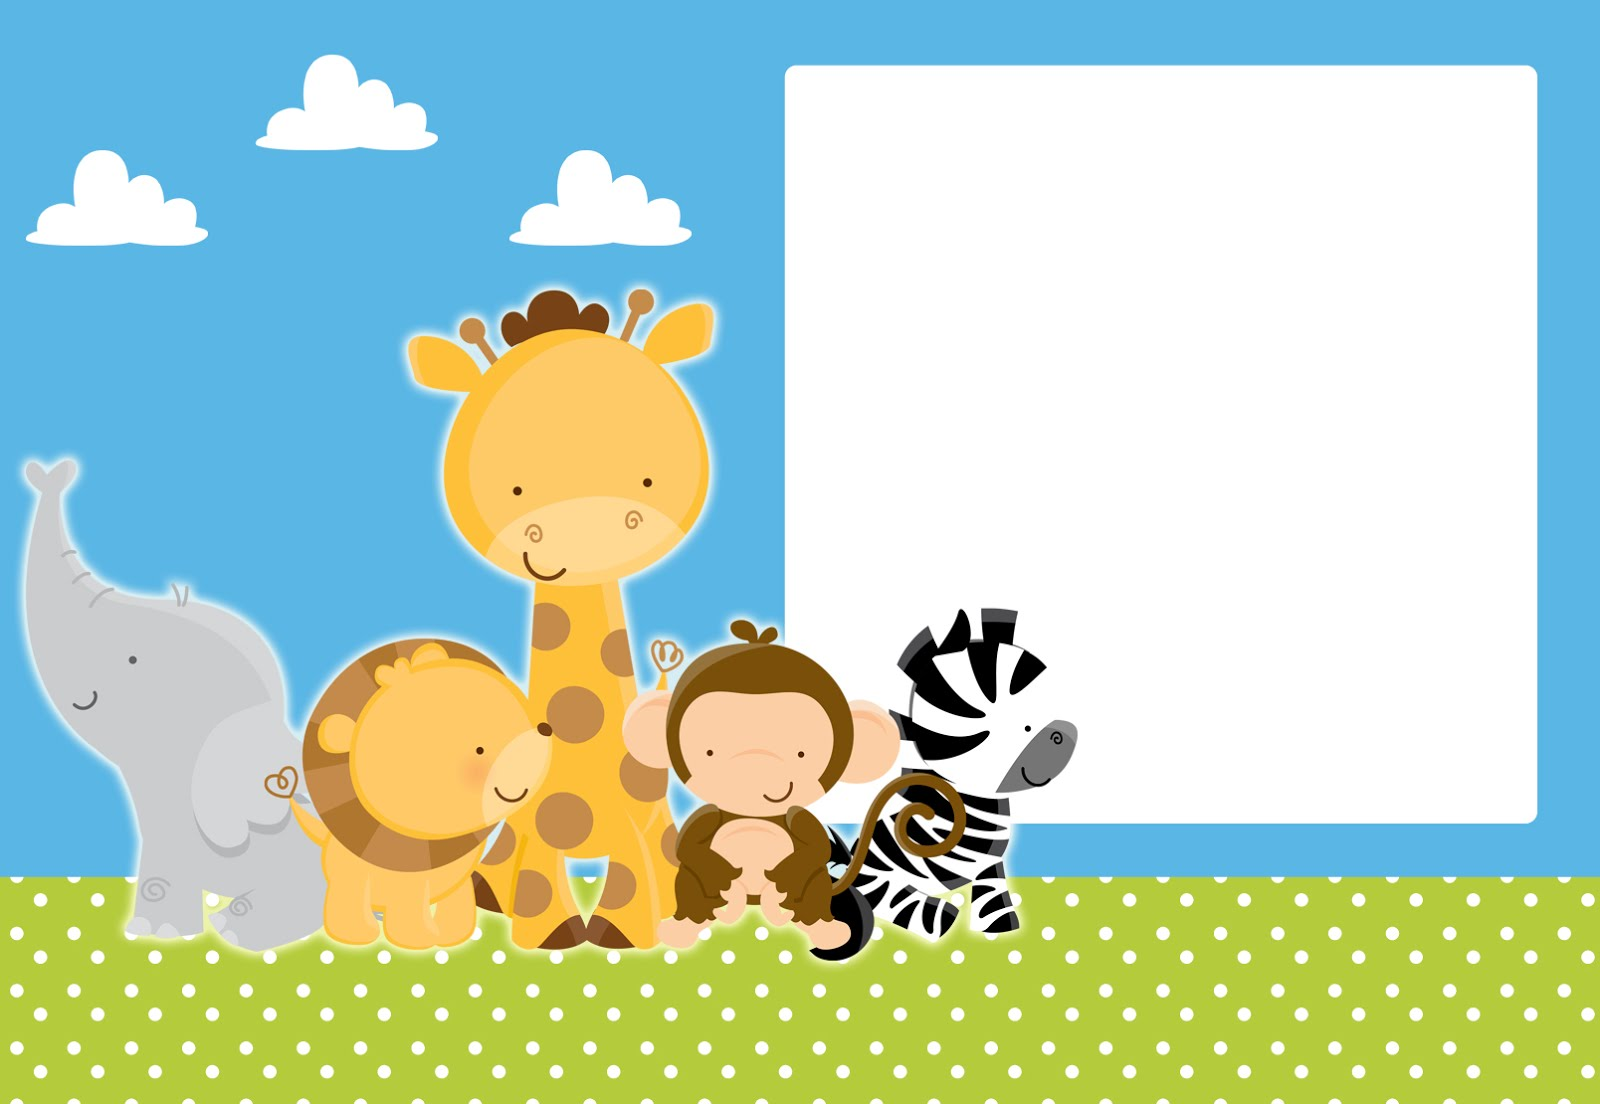 Tiernos Bebés de la Selva: Mini Kit para Imprimir Gratis. | Oh My Bebé!